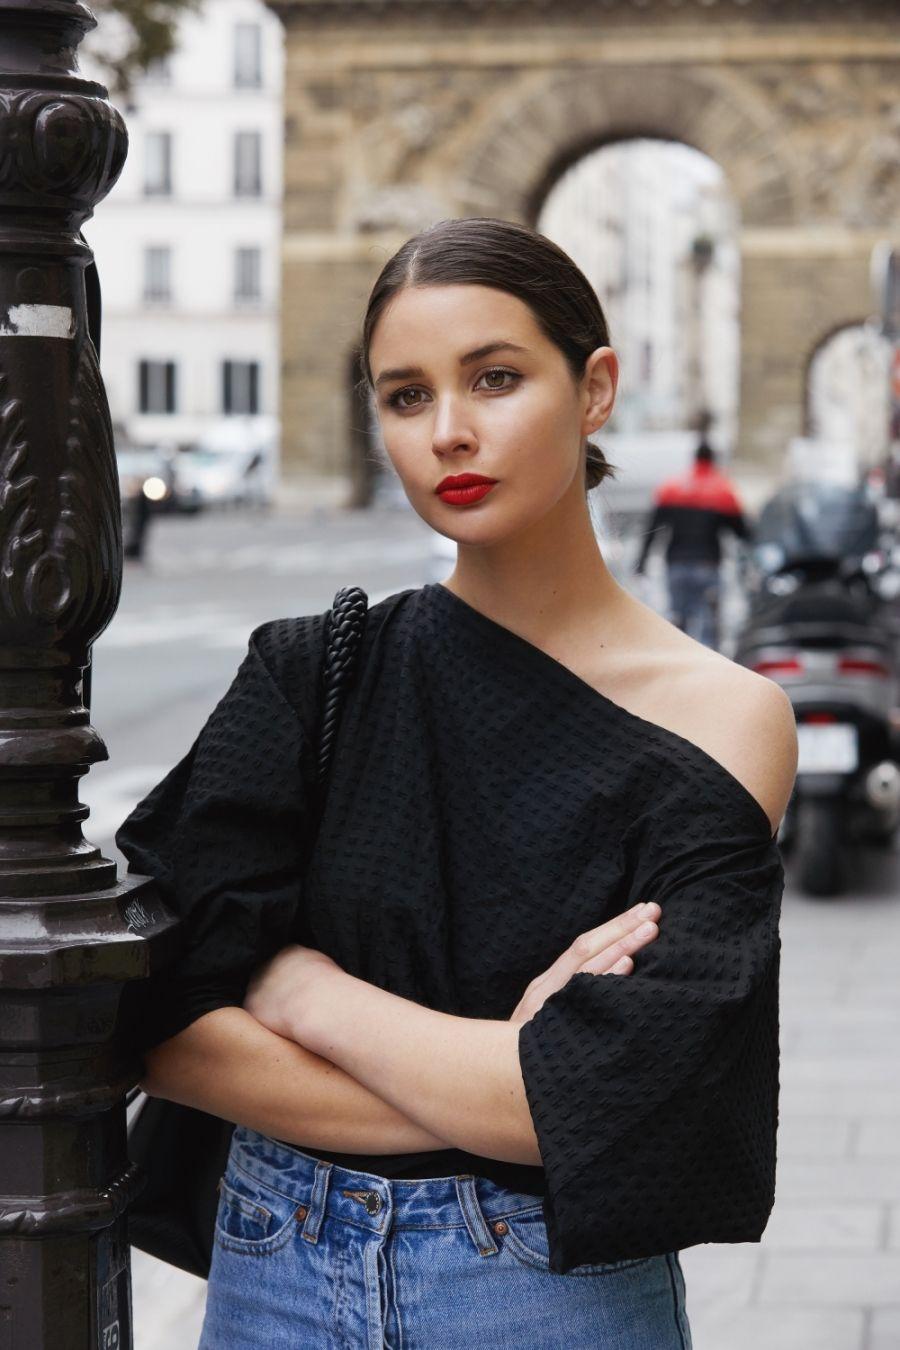 Black And Denim In Paris Red Lipstick Beauty Harperandharley Wedding Hair Trends Ponytail Styles Style [ 1350 x 900 Pixel ]